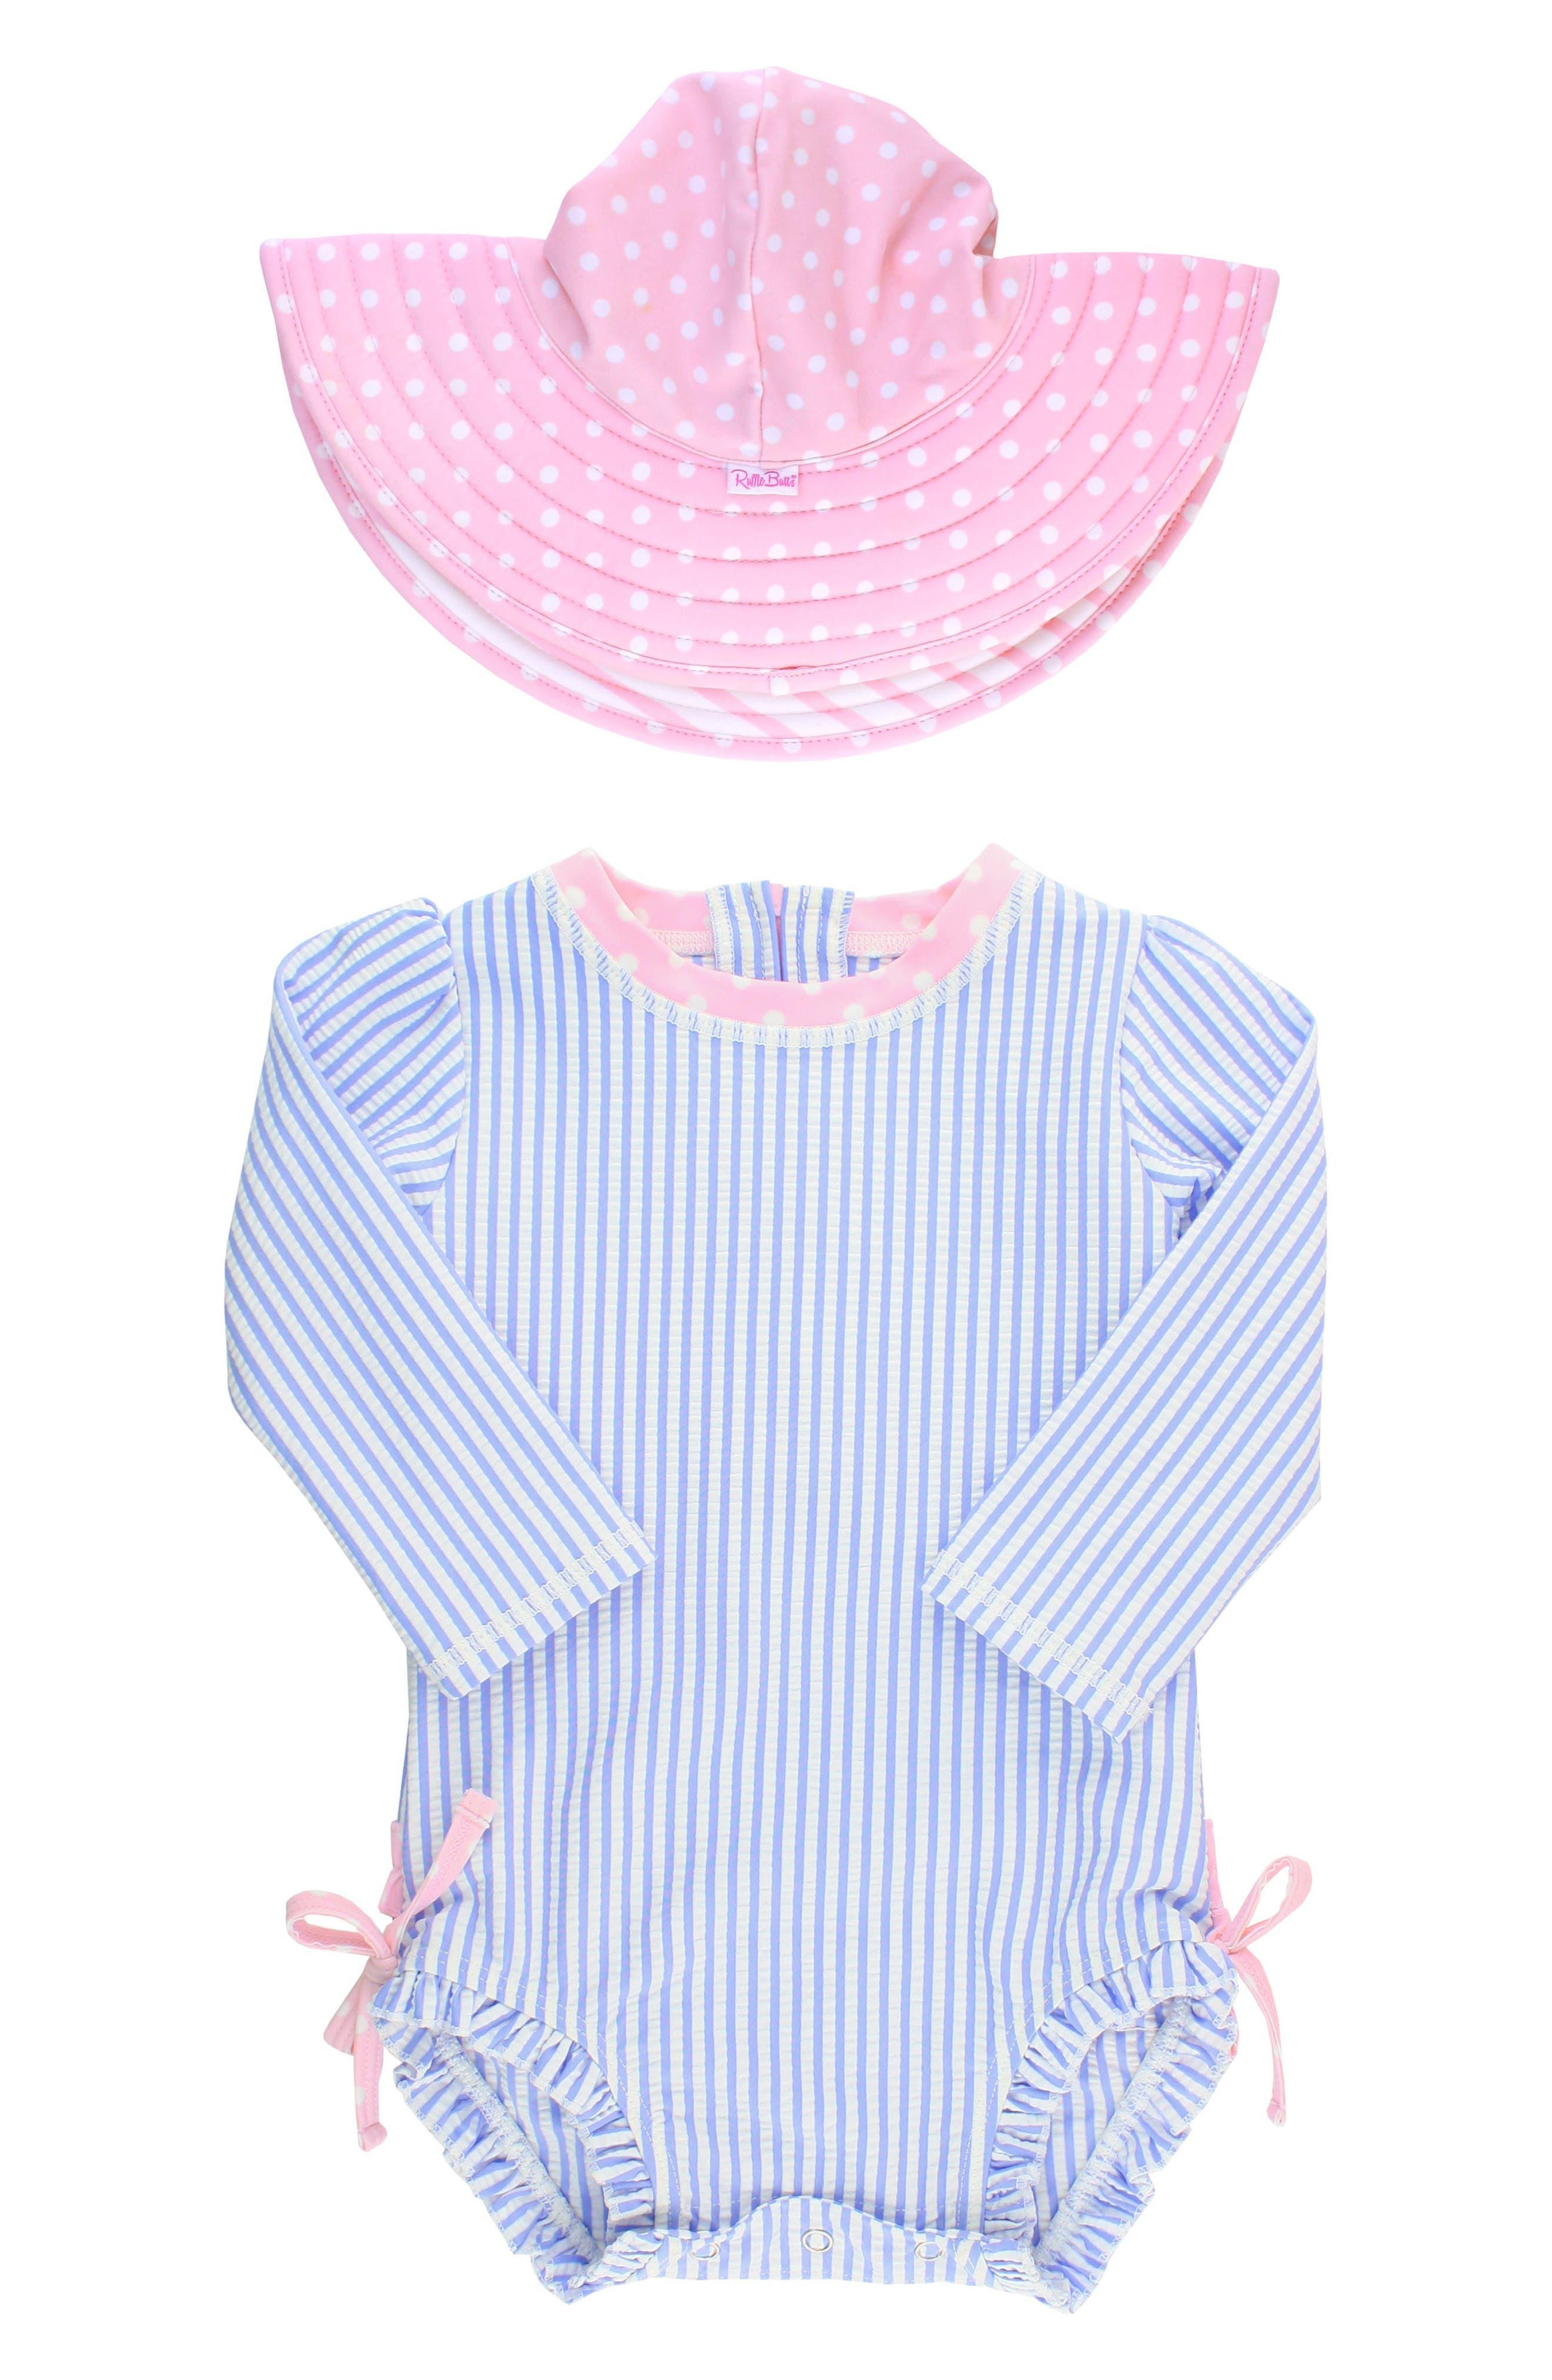 Ruffle Butts Seersucker One-Piece Rashguard Swimsuit & Hat Set,                         Main,                         color, BLUE